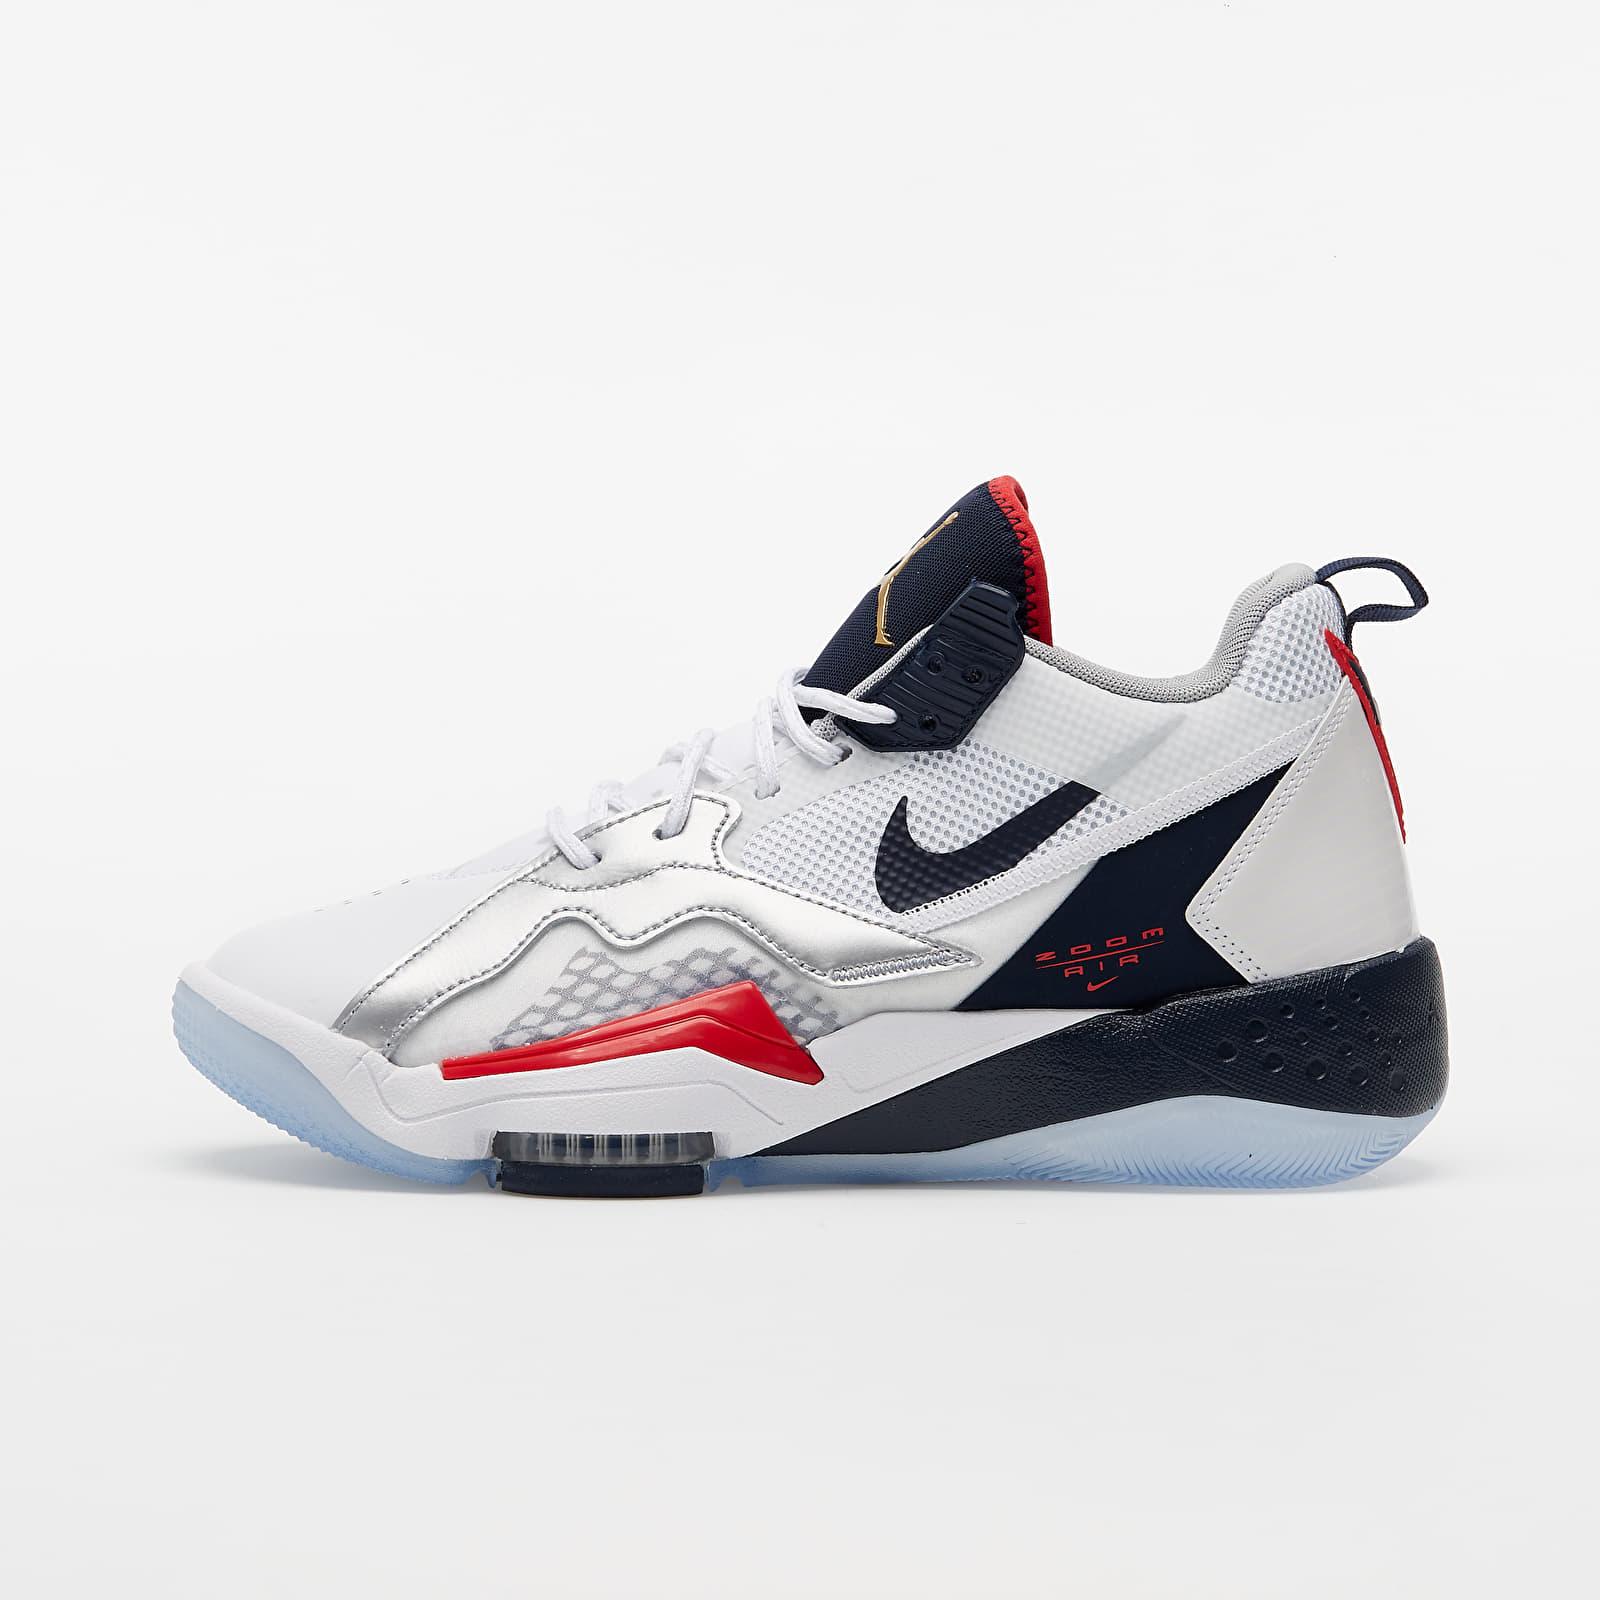 Pánské tenisky a boty Jordan Zoom '92 White/ Obsidian-True Red-Metallic Silver